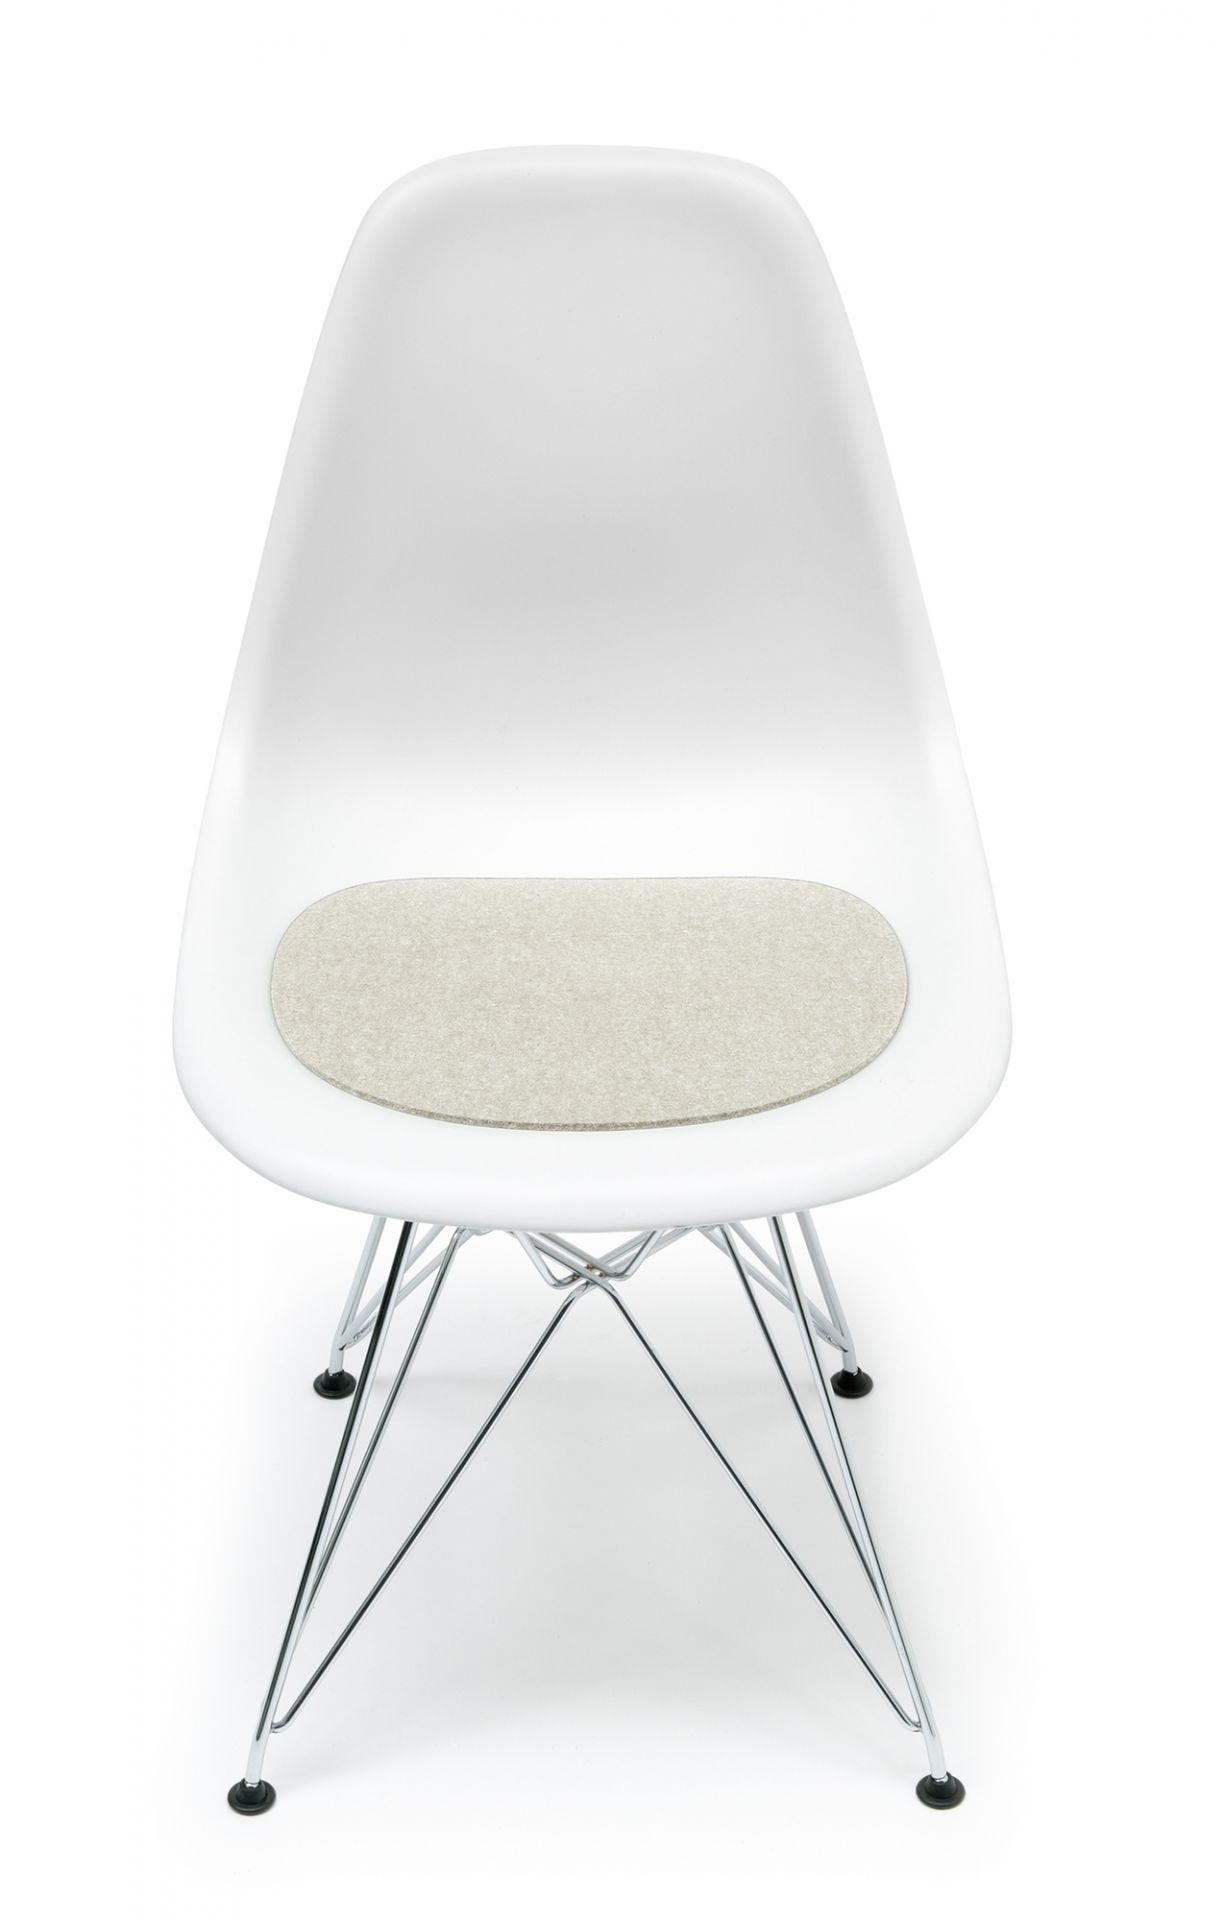 Sitzauflage-Filzauflage Eames Plastic Side Chairs DSR / DSW Marmor Hey Sign